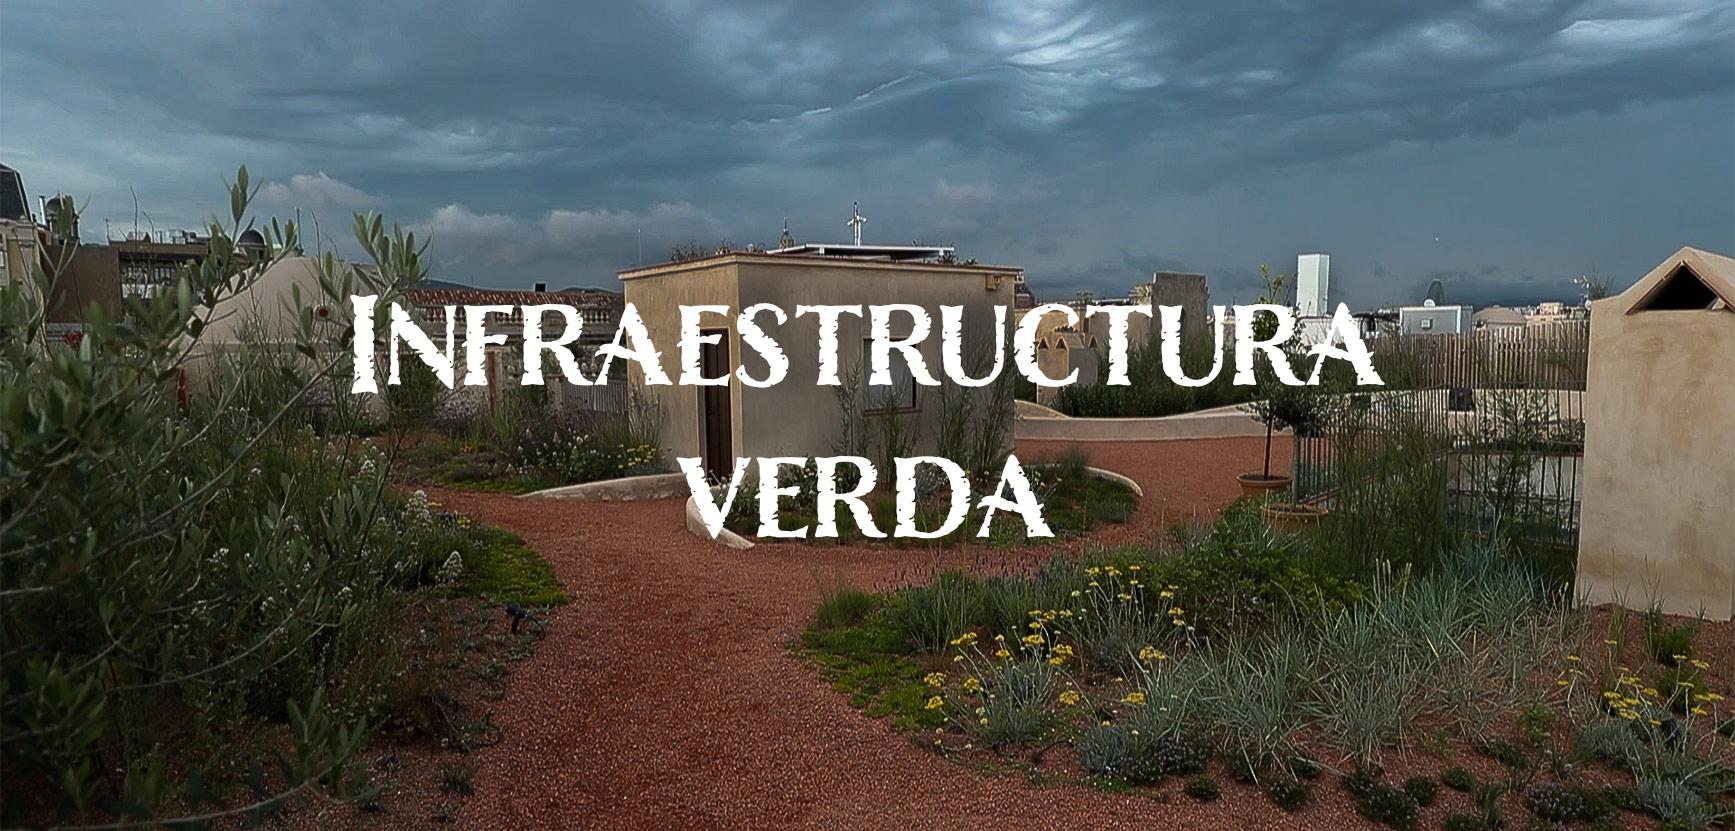 Infraestructura verda